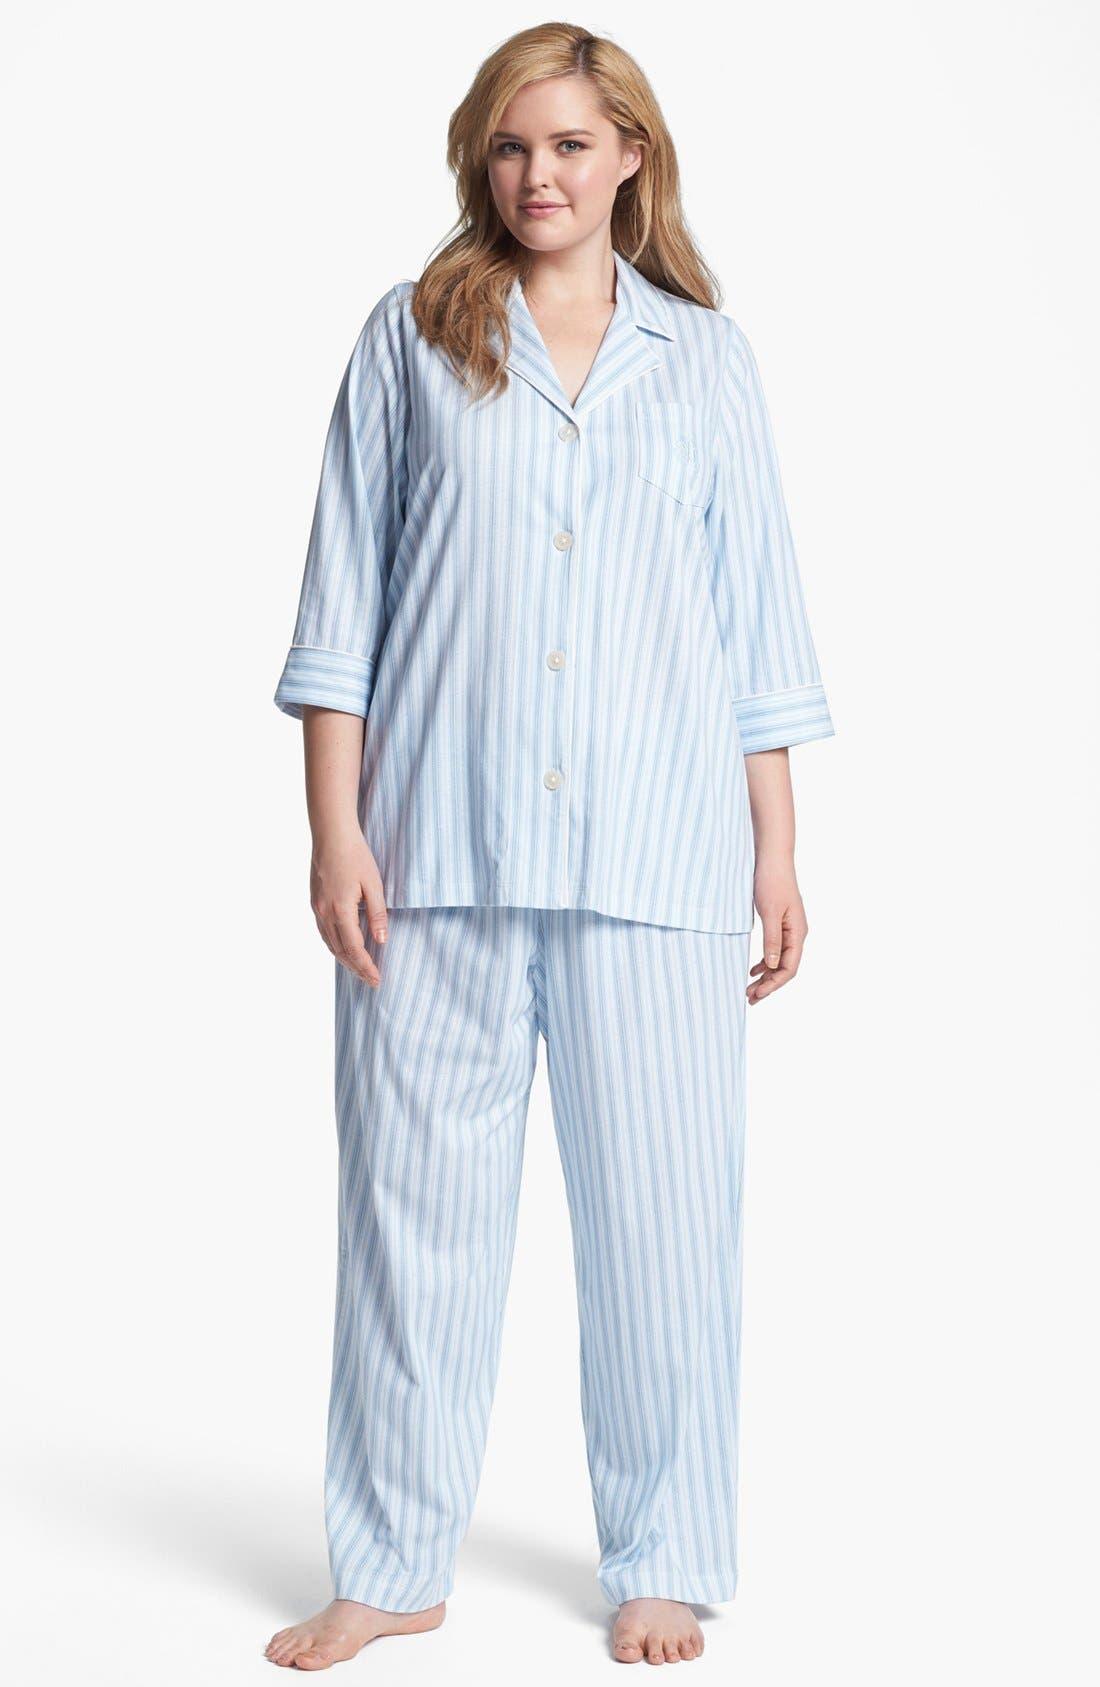 Alternate Image 1 Selected - Lauren Ralph Lauren Stripe Knit Pajamas (Plus Size)